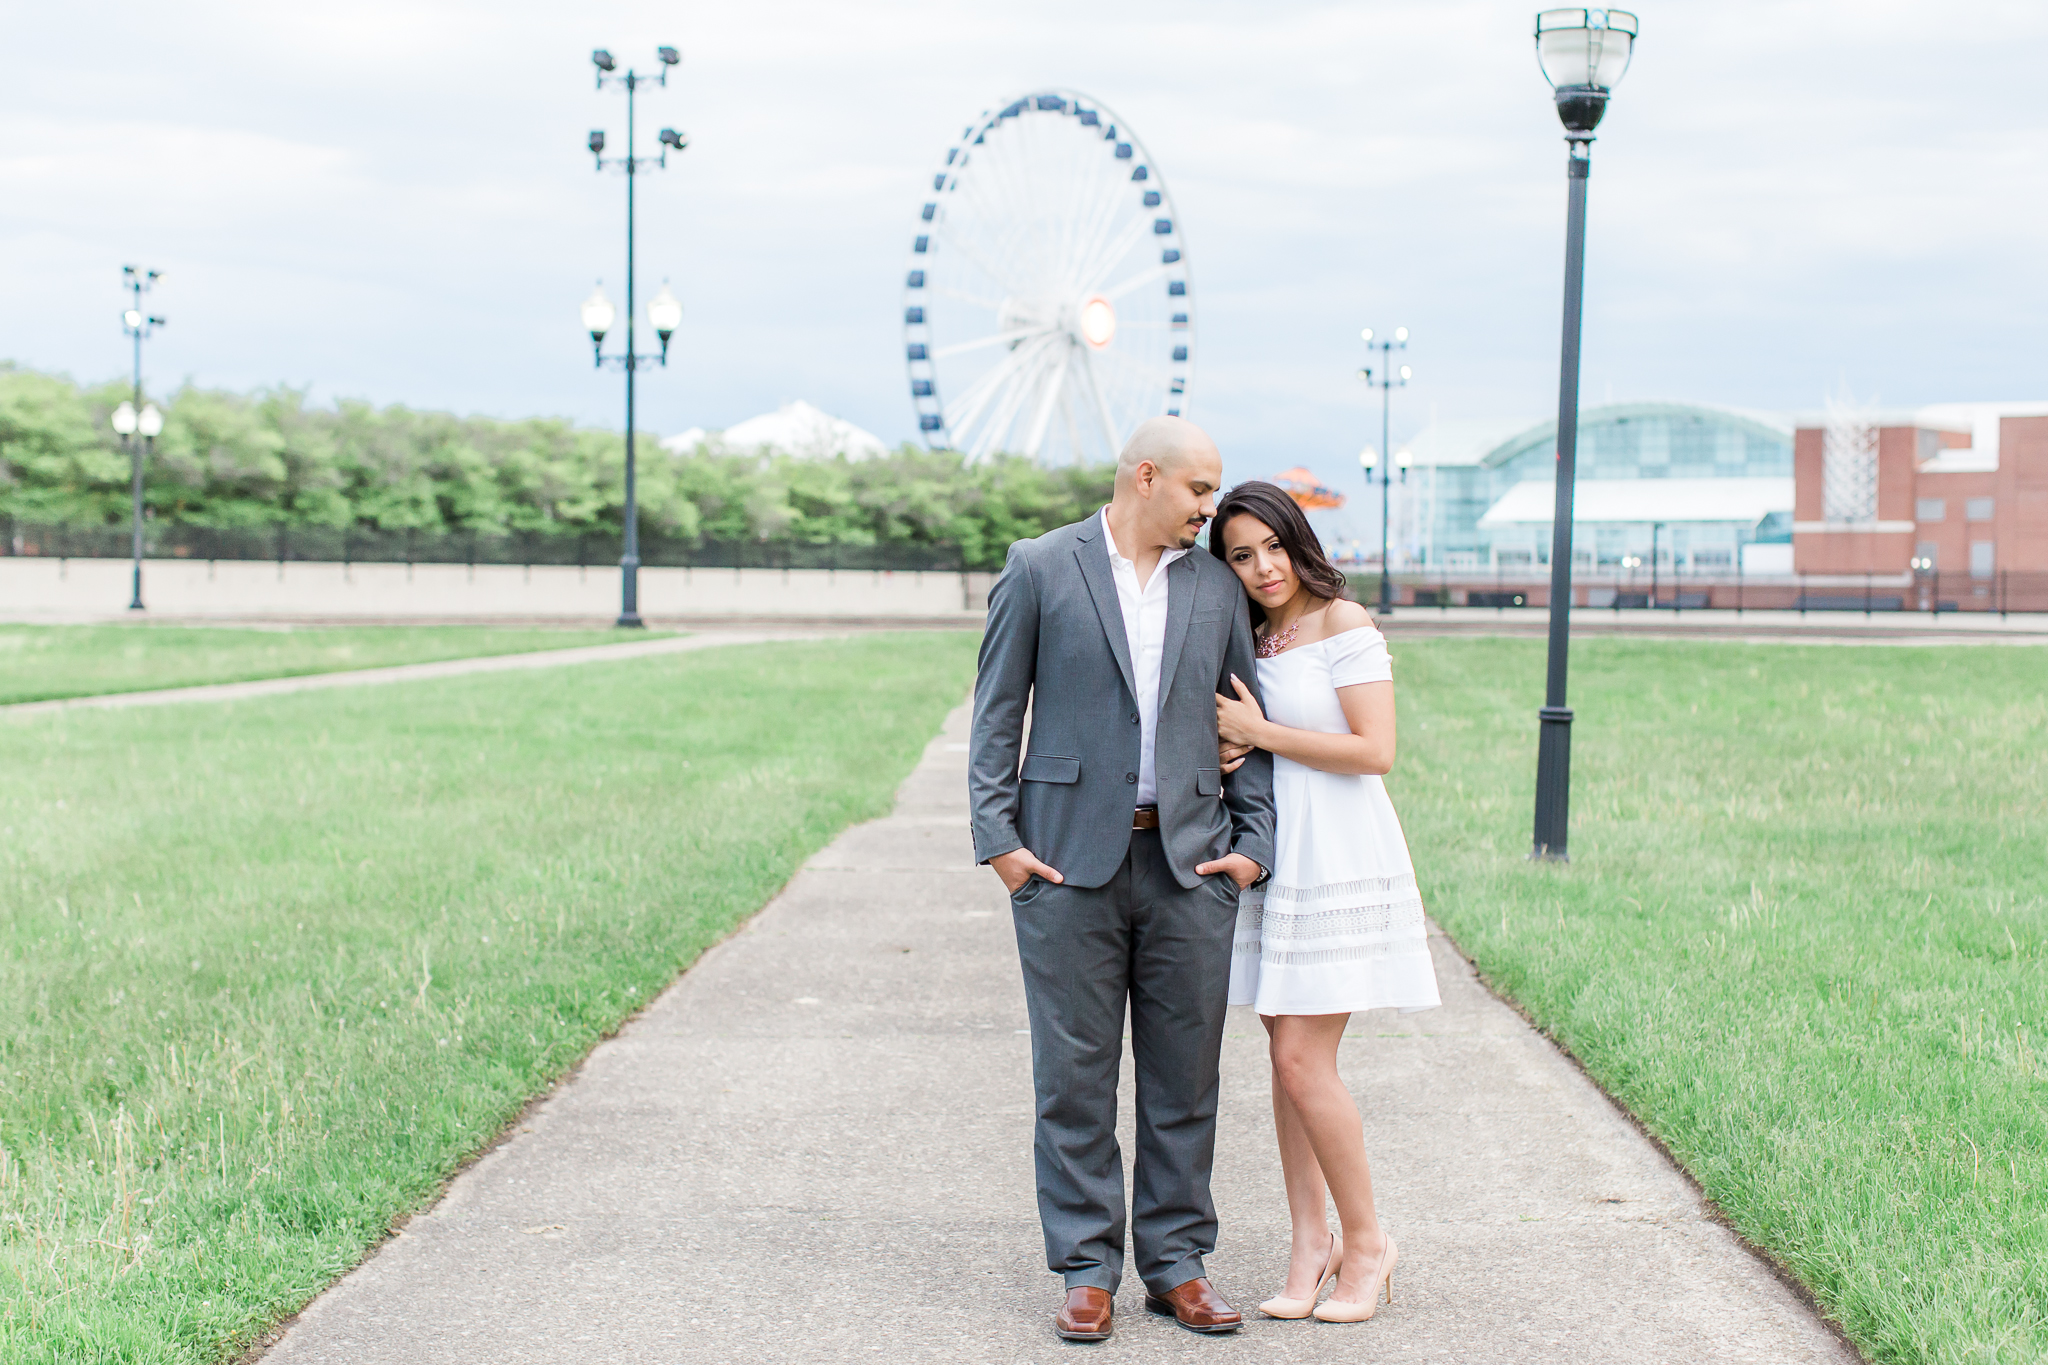 wedding-photographer-chicago-classy-engagement-olive-park-22